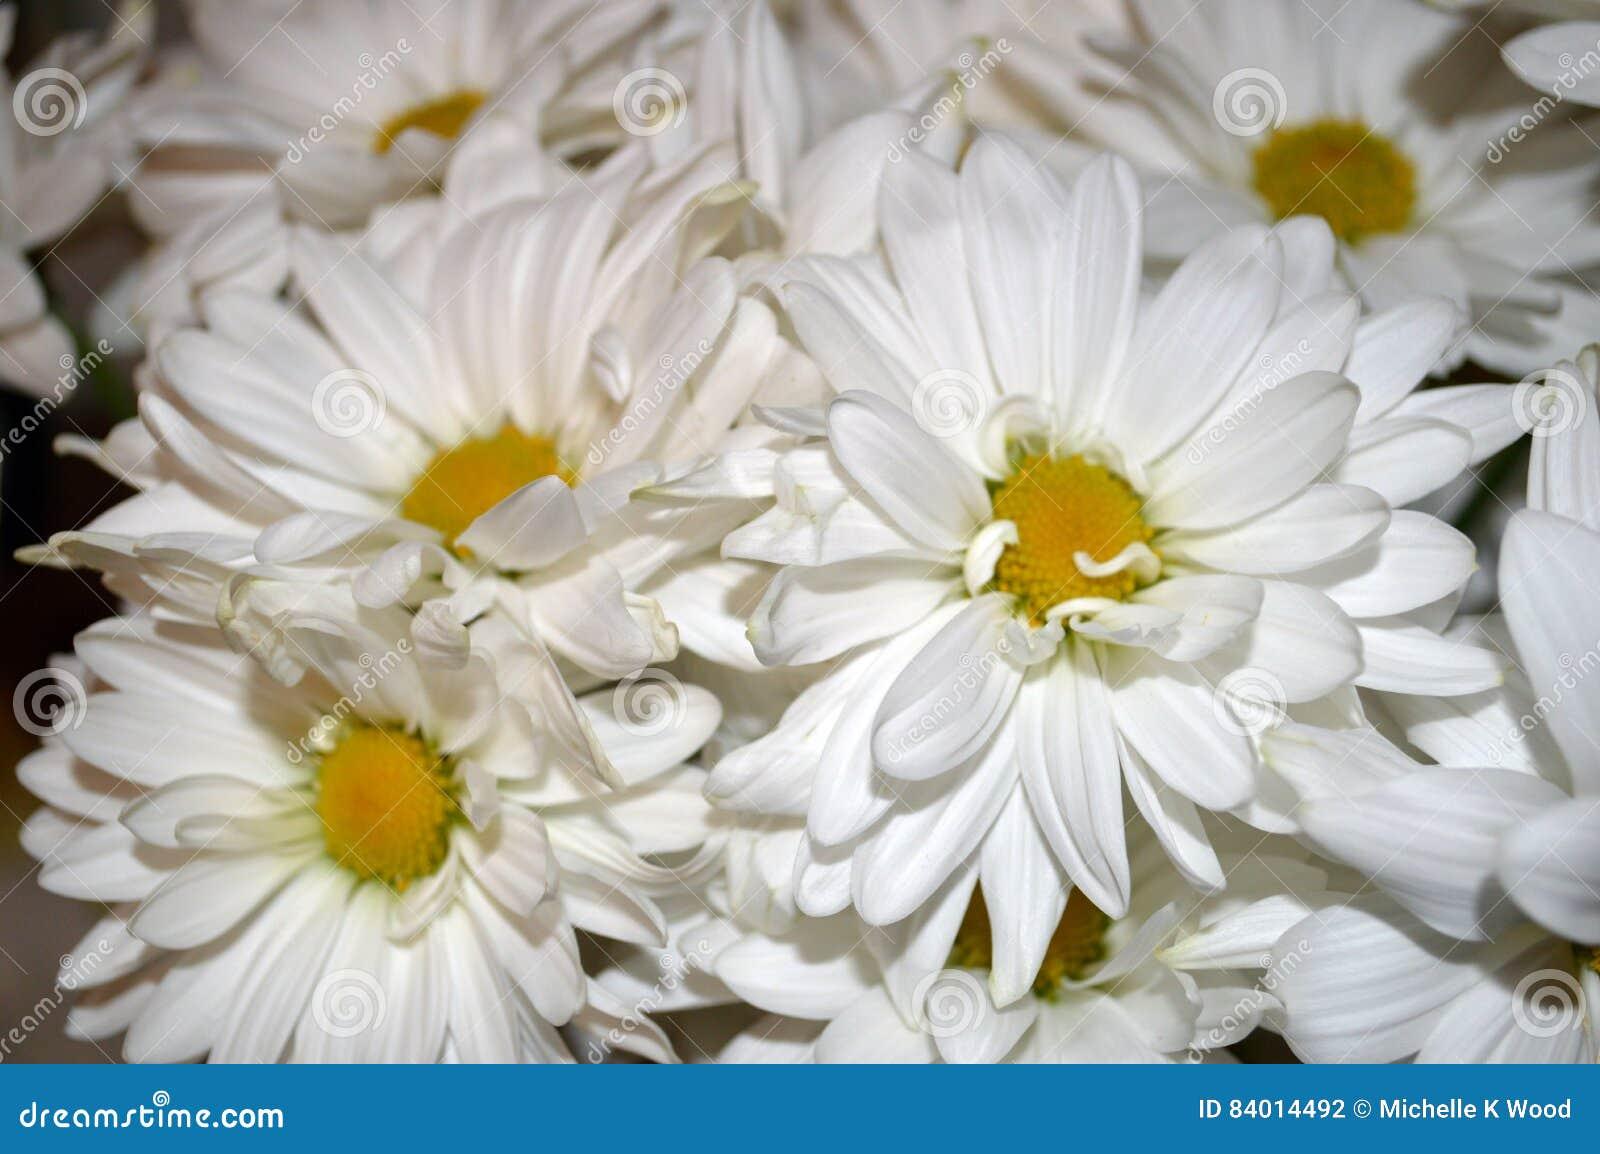 White double daisy close up